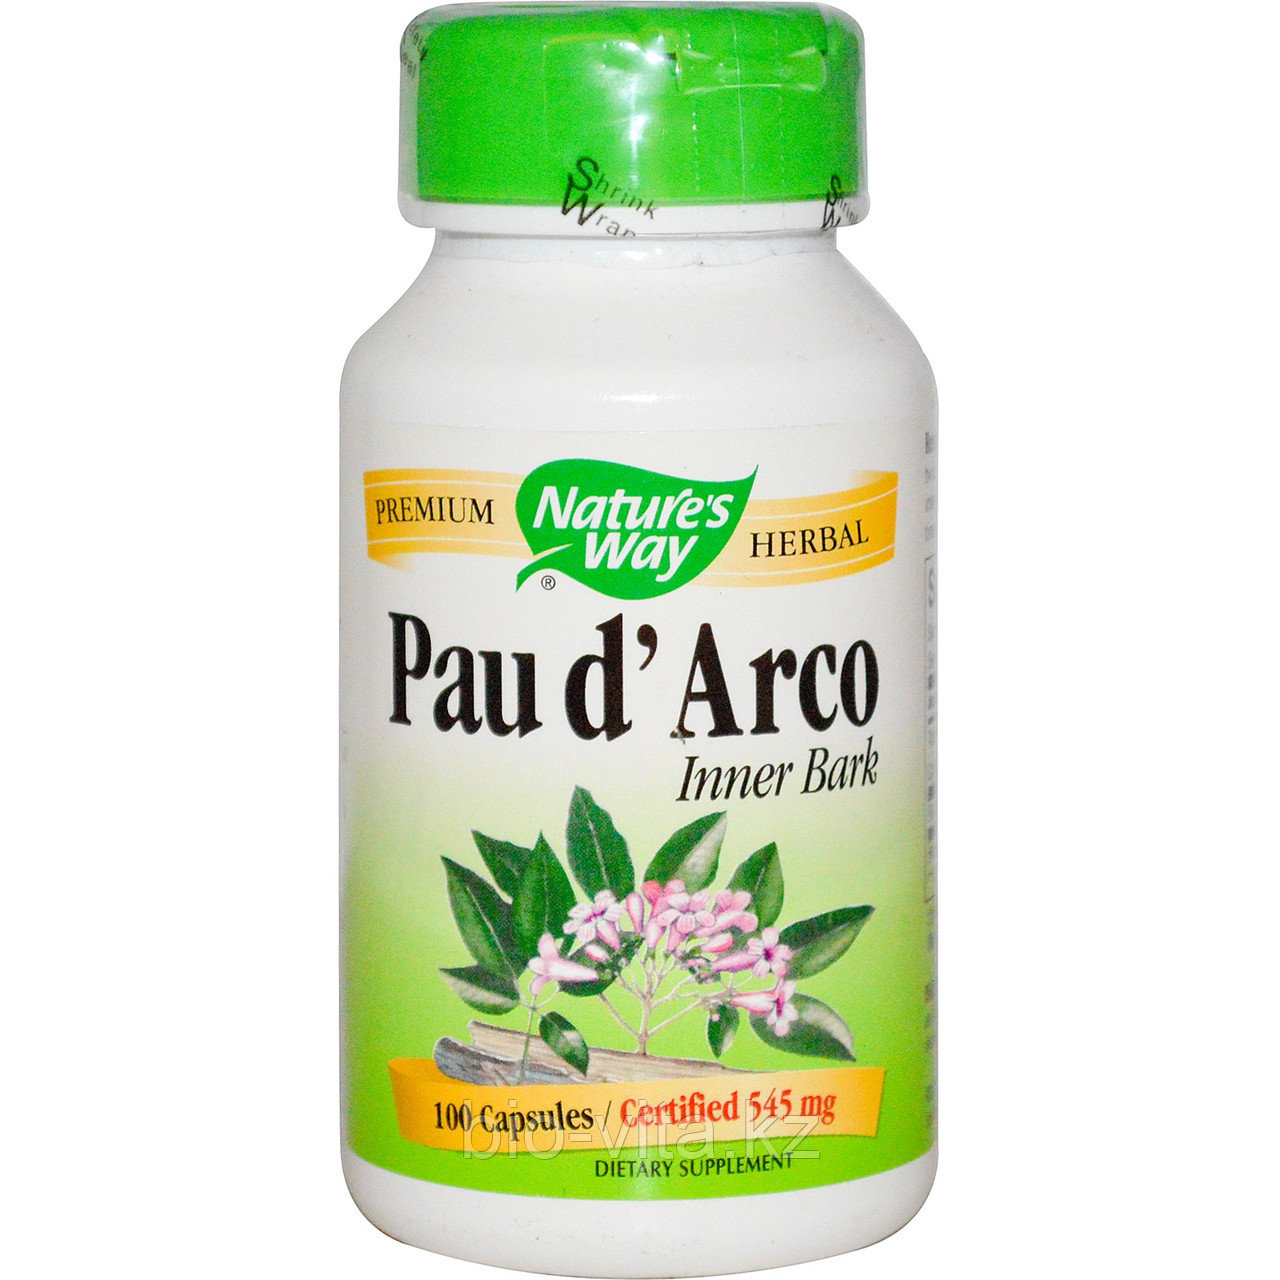 Кора муравьиного дерева.(Pau d'Arco )  Nature's Way, Внутренний луб  545 мг, 100 капсул